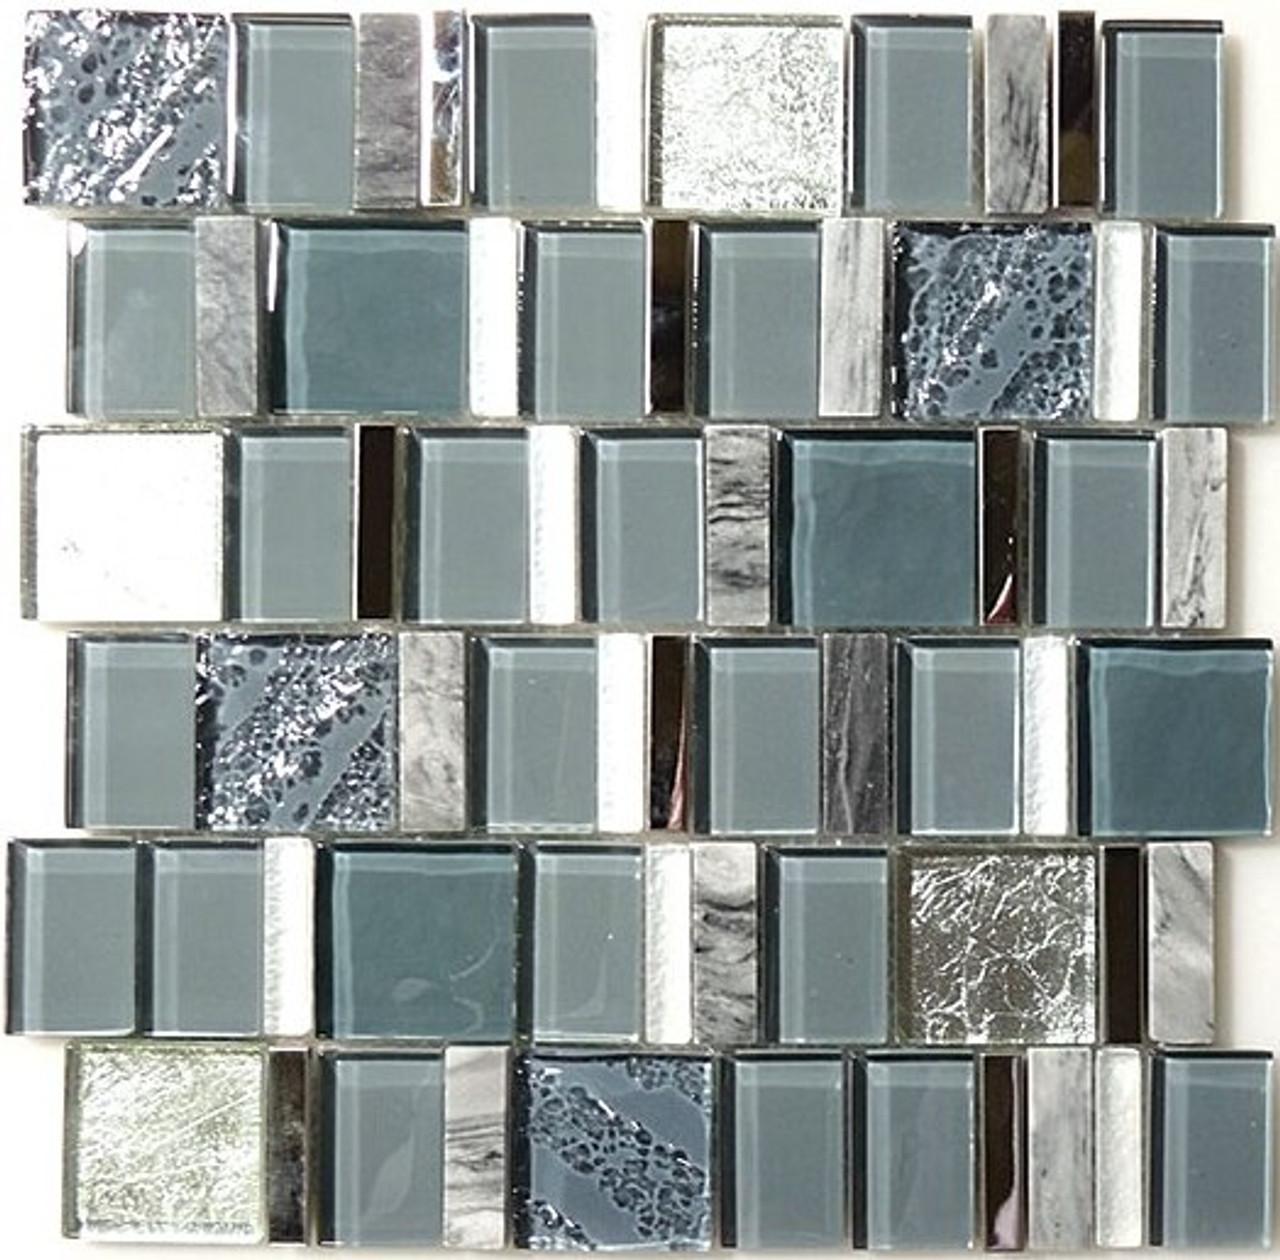 Bella Glass Tiles Academia Series Oceanic Cerulean